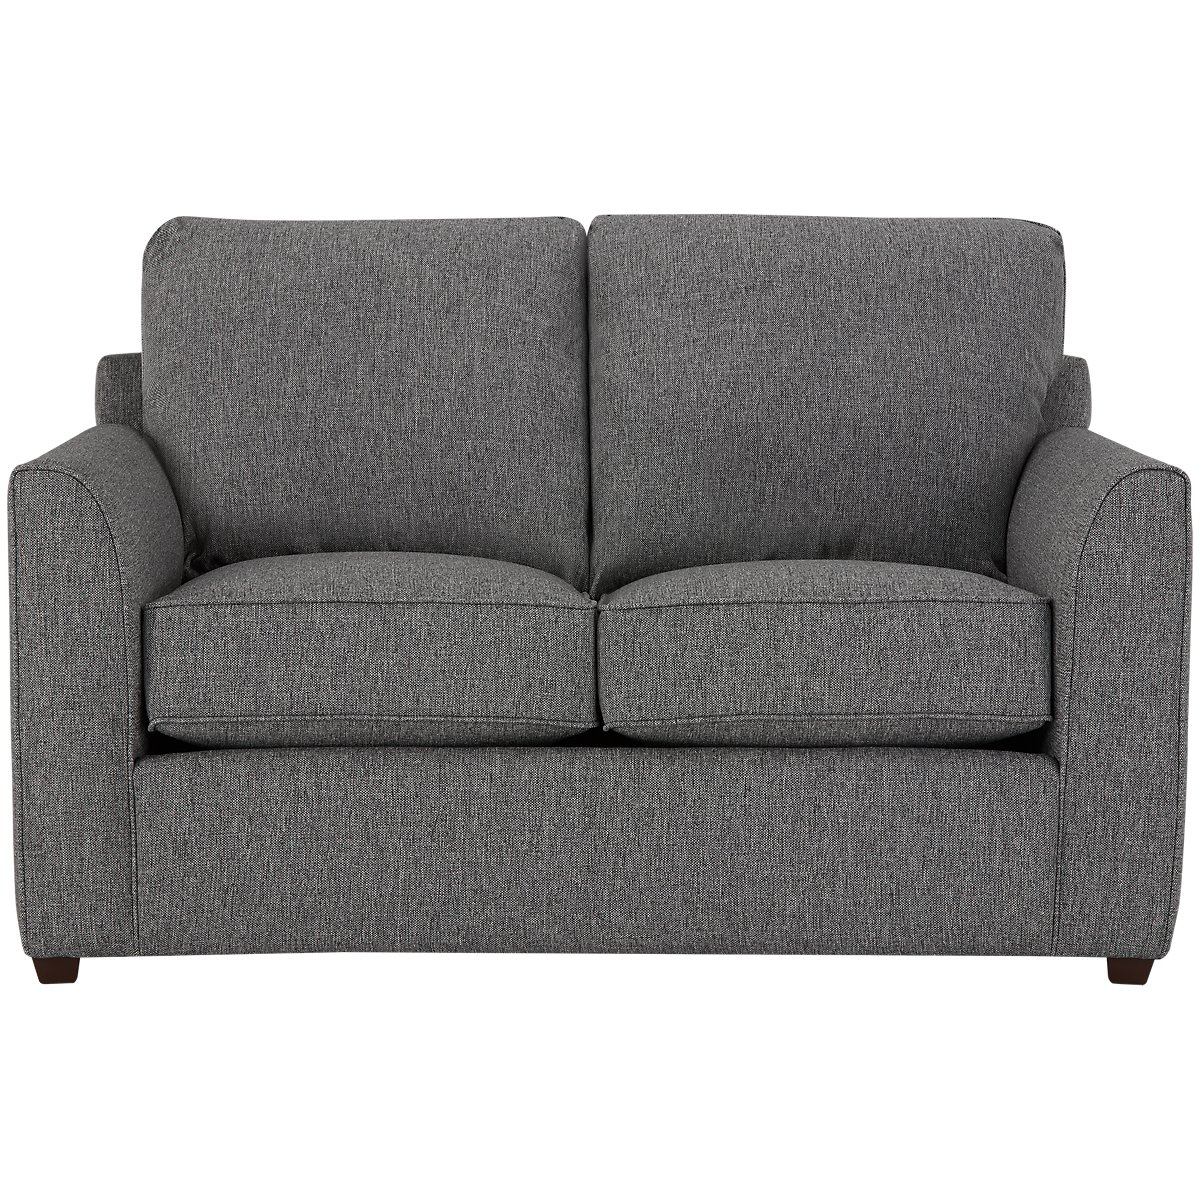 City Furniture Asheville Gray Fabric Loveseat